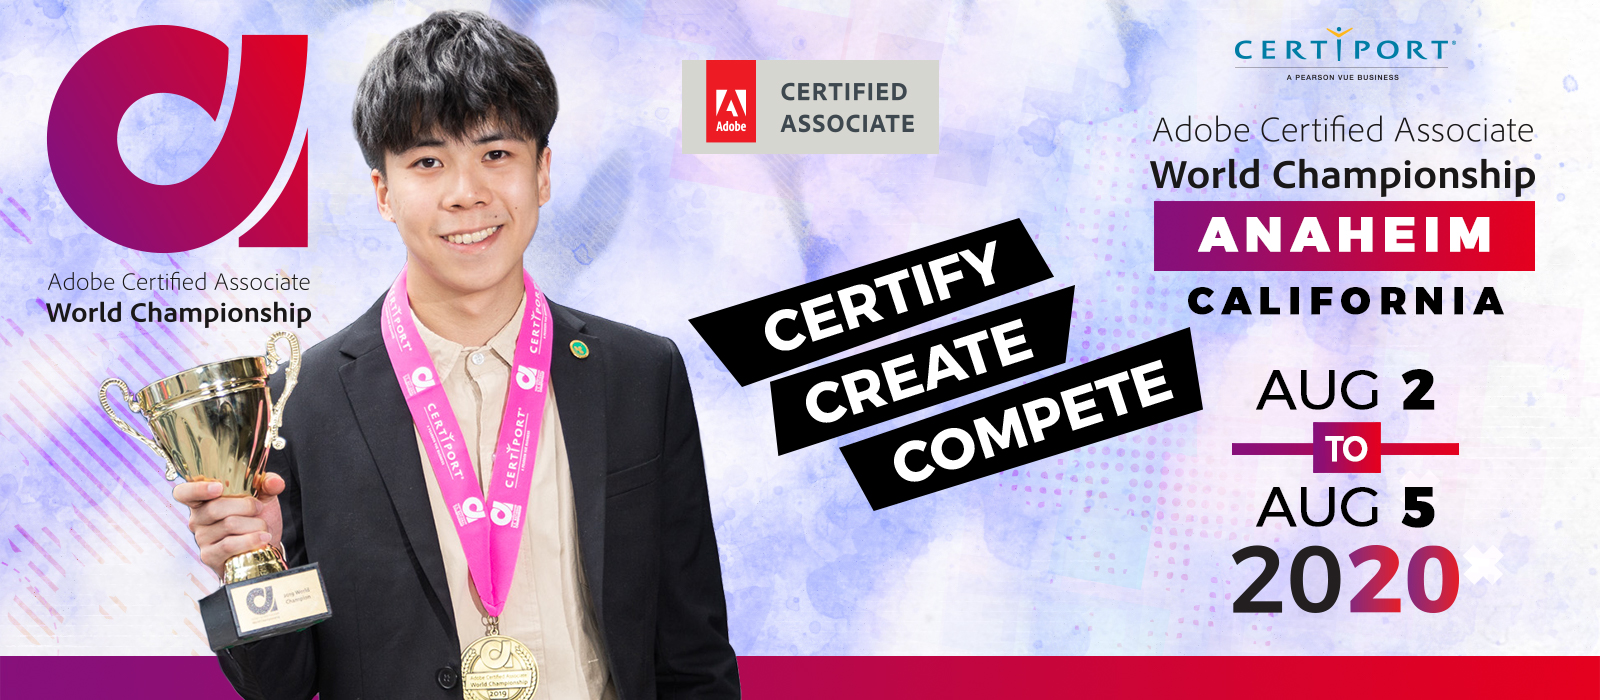 Adobe Certified Associate World Championship New York, New York